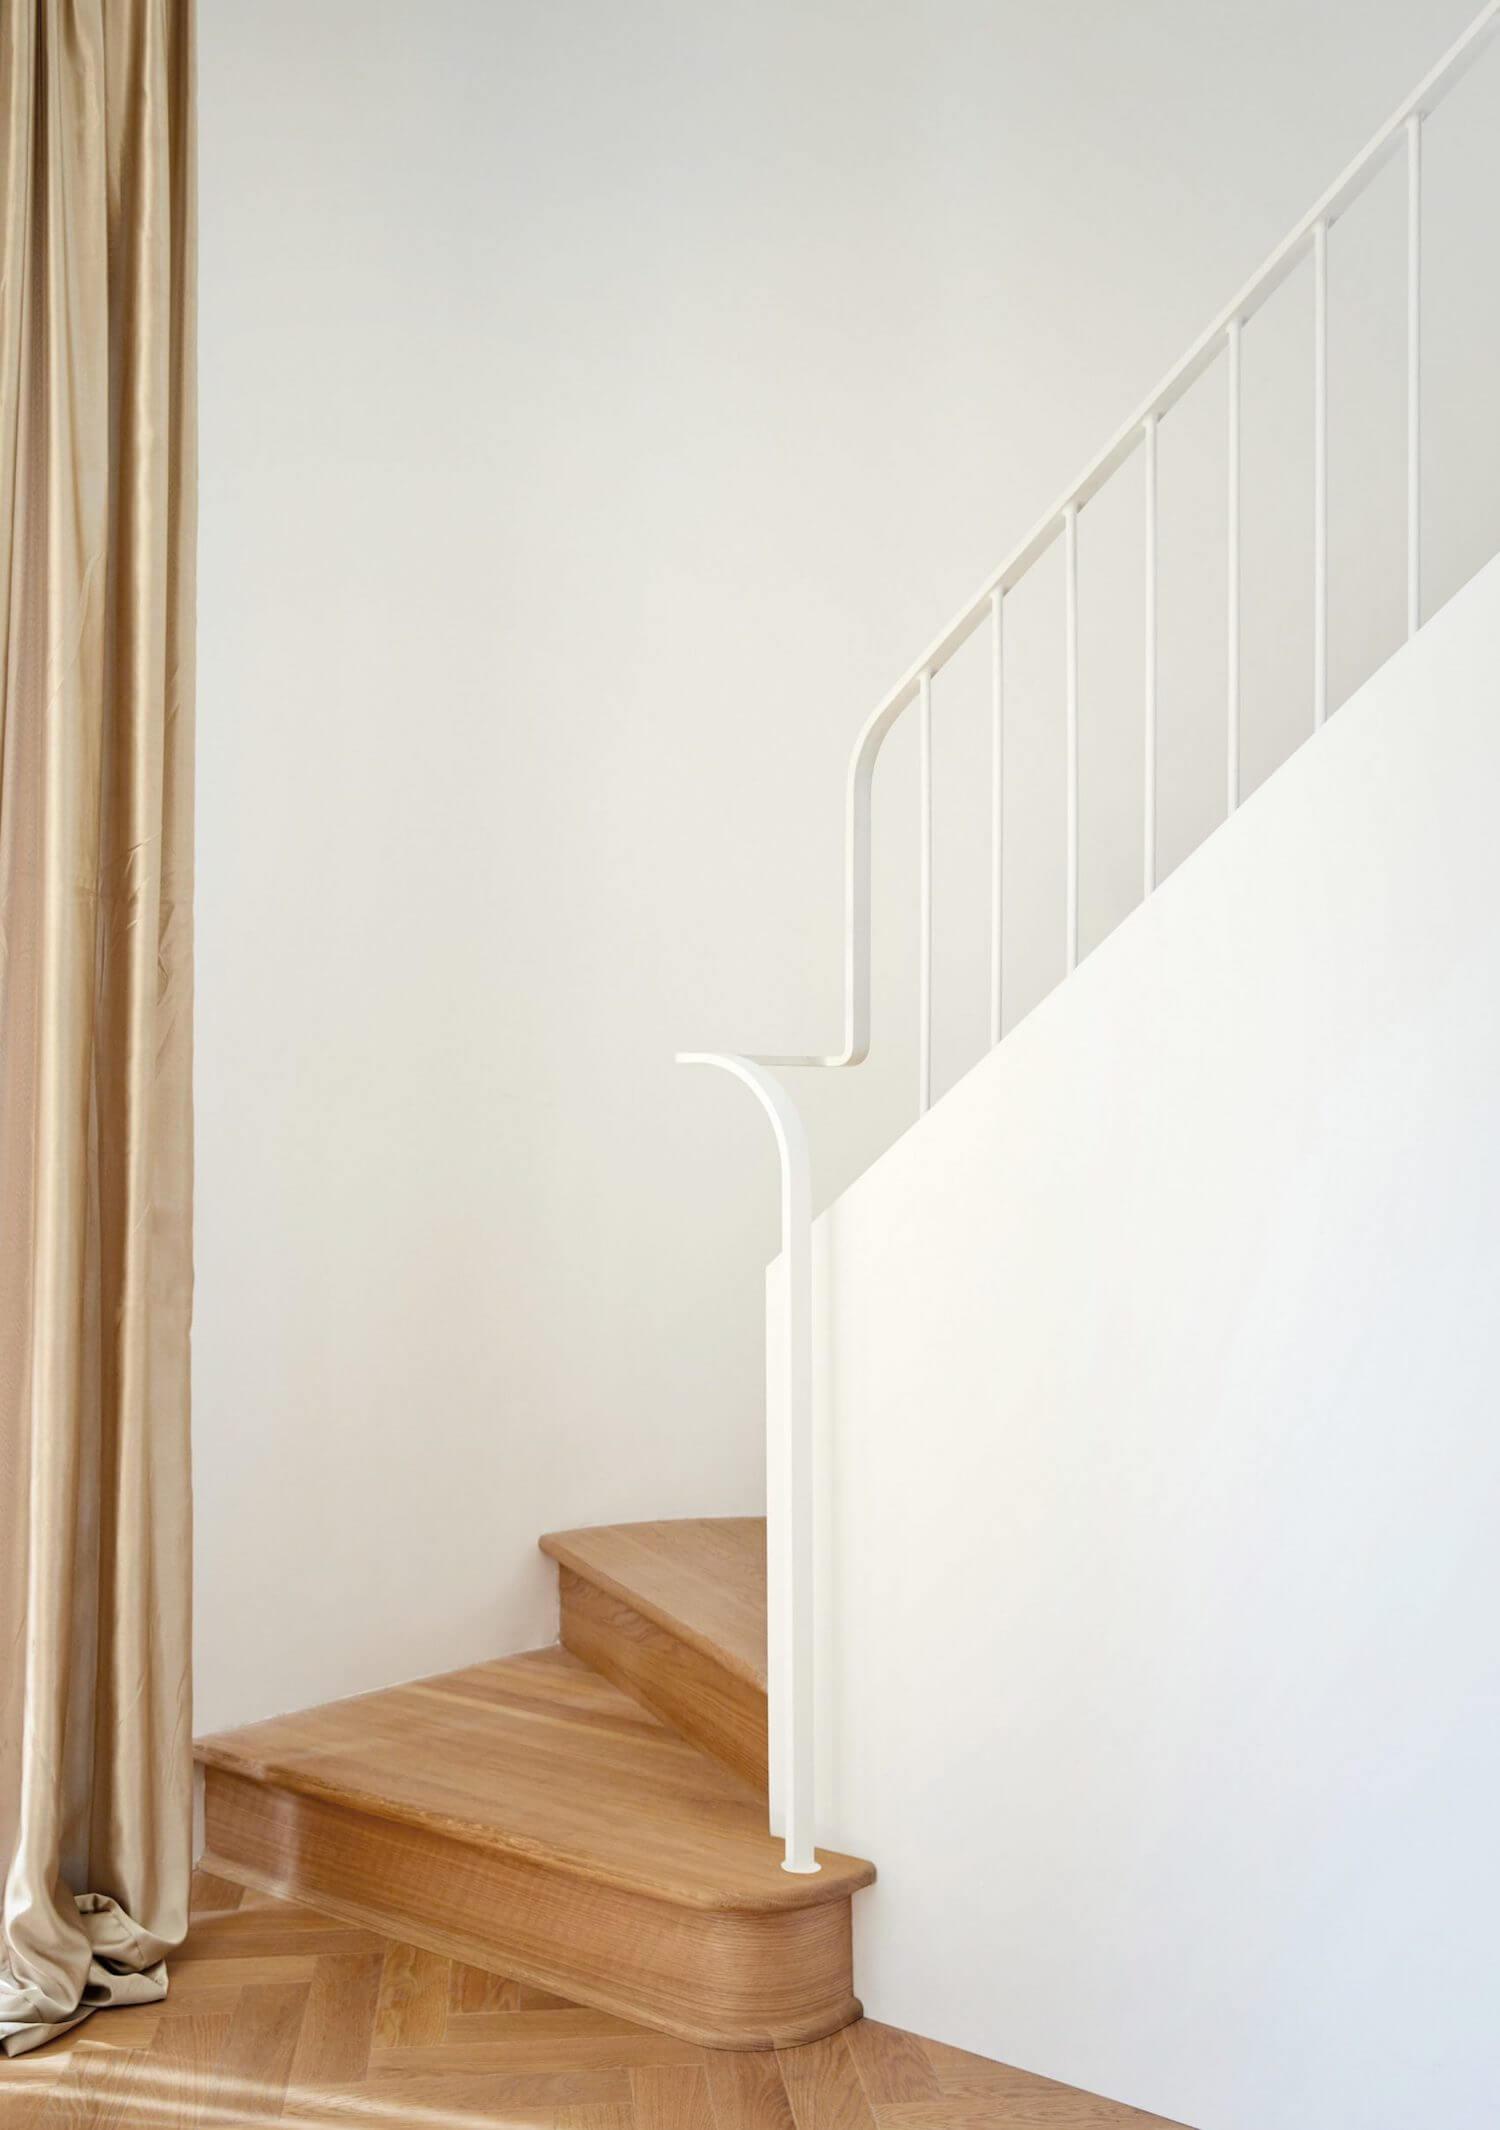 villeneuve residence atelier barda architecture interiors canada 8